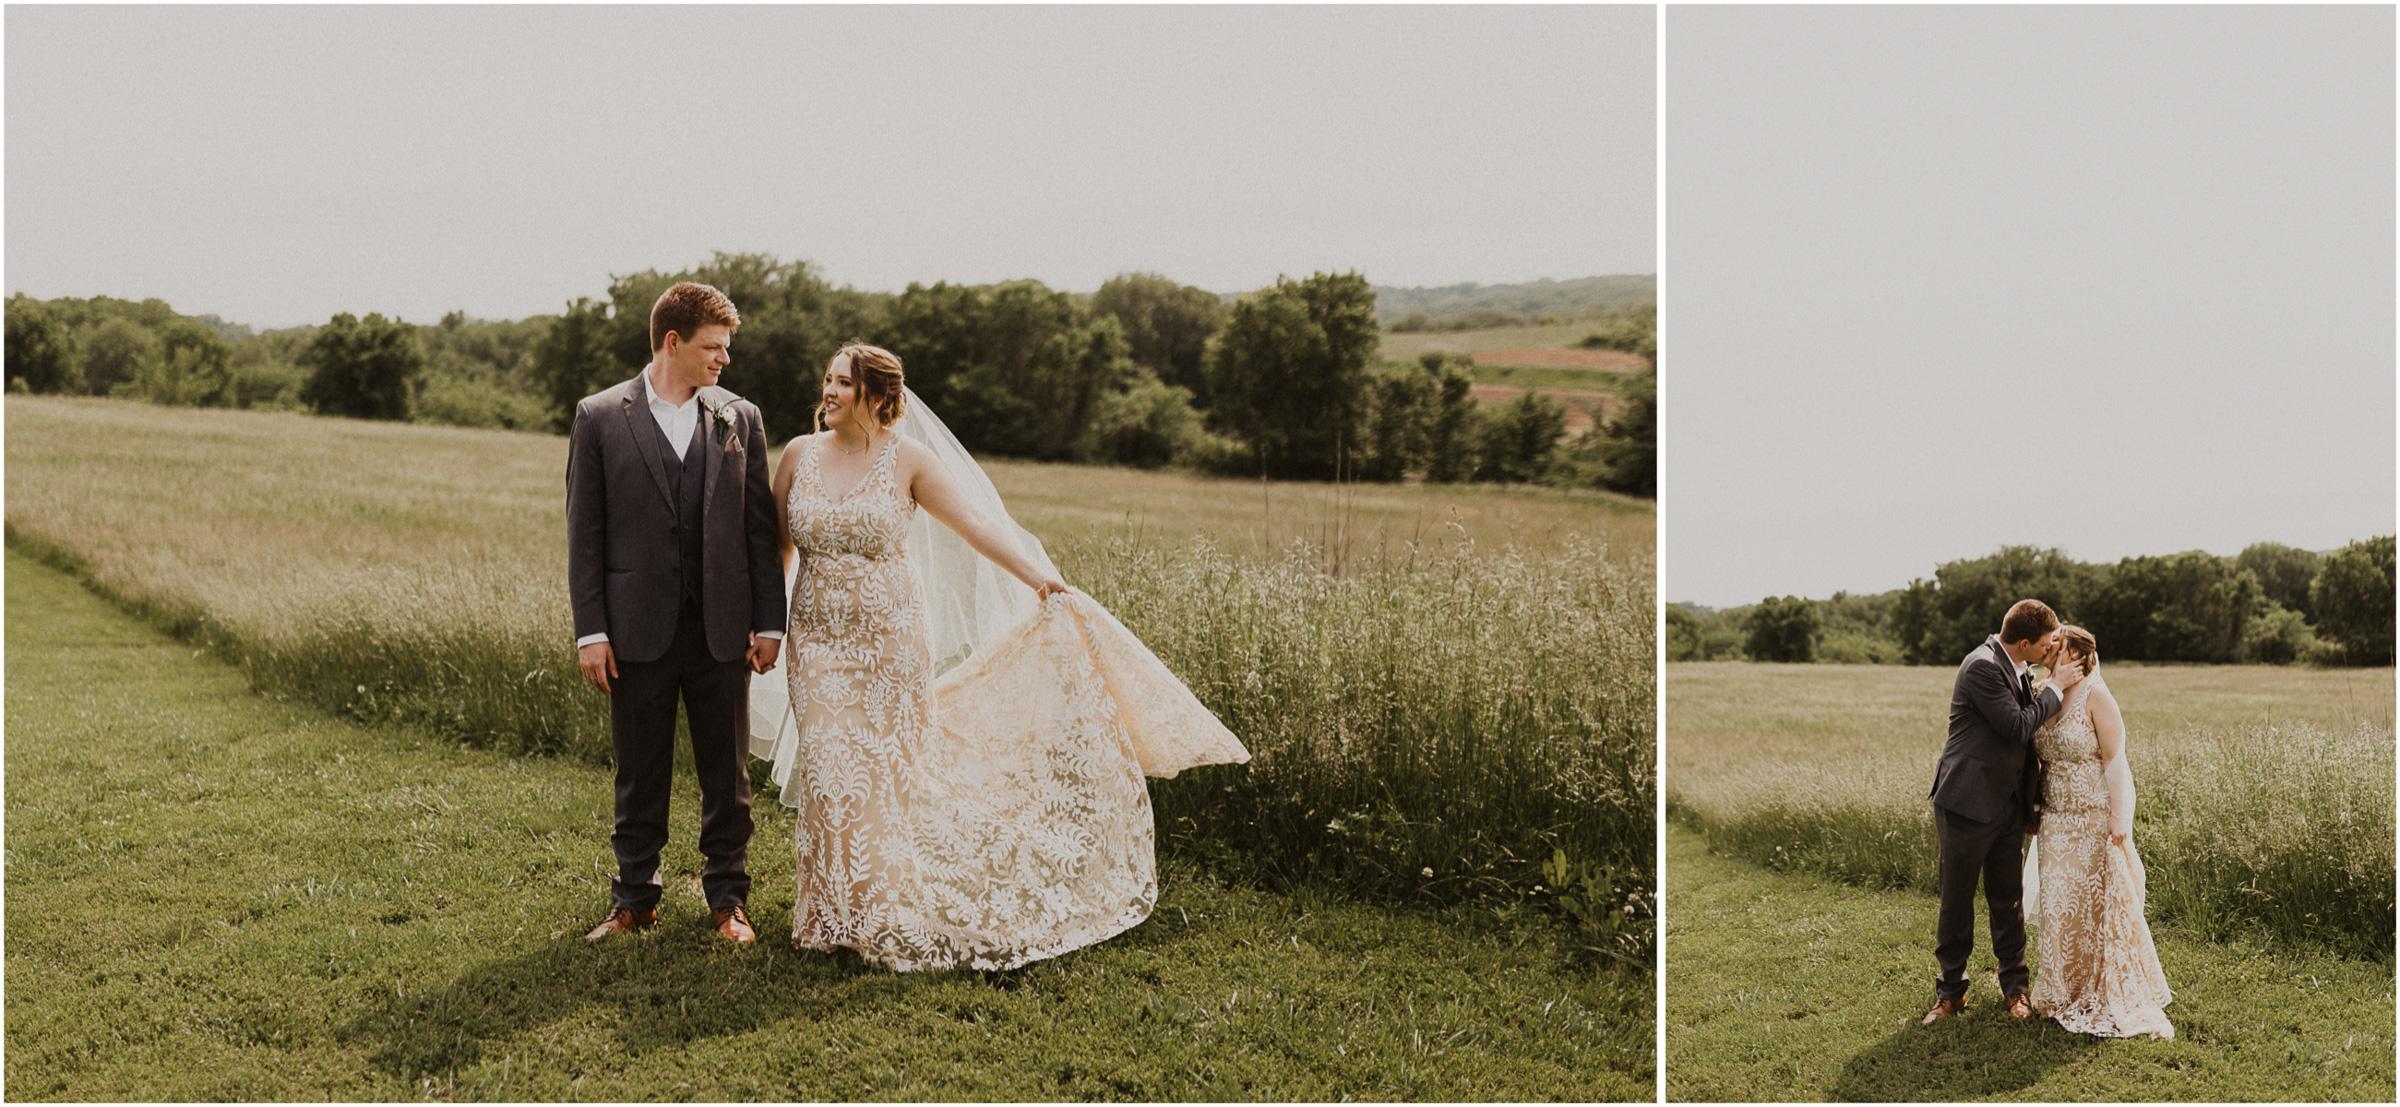 alyssa barletter photography weston red barn farm timberbarn summer outdoor wedding-37.jpg